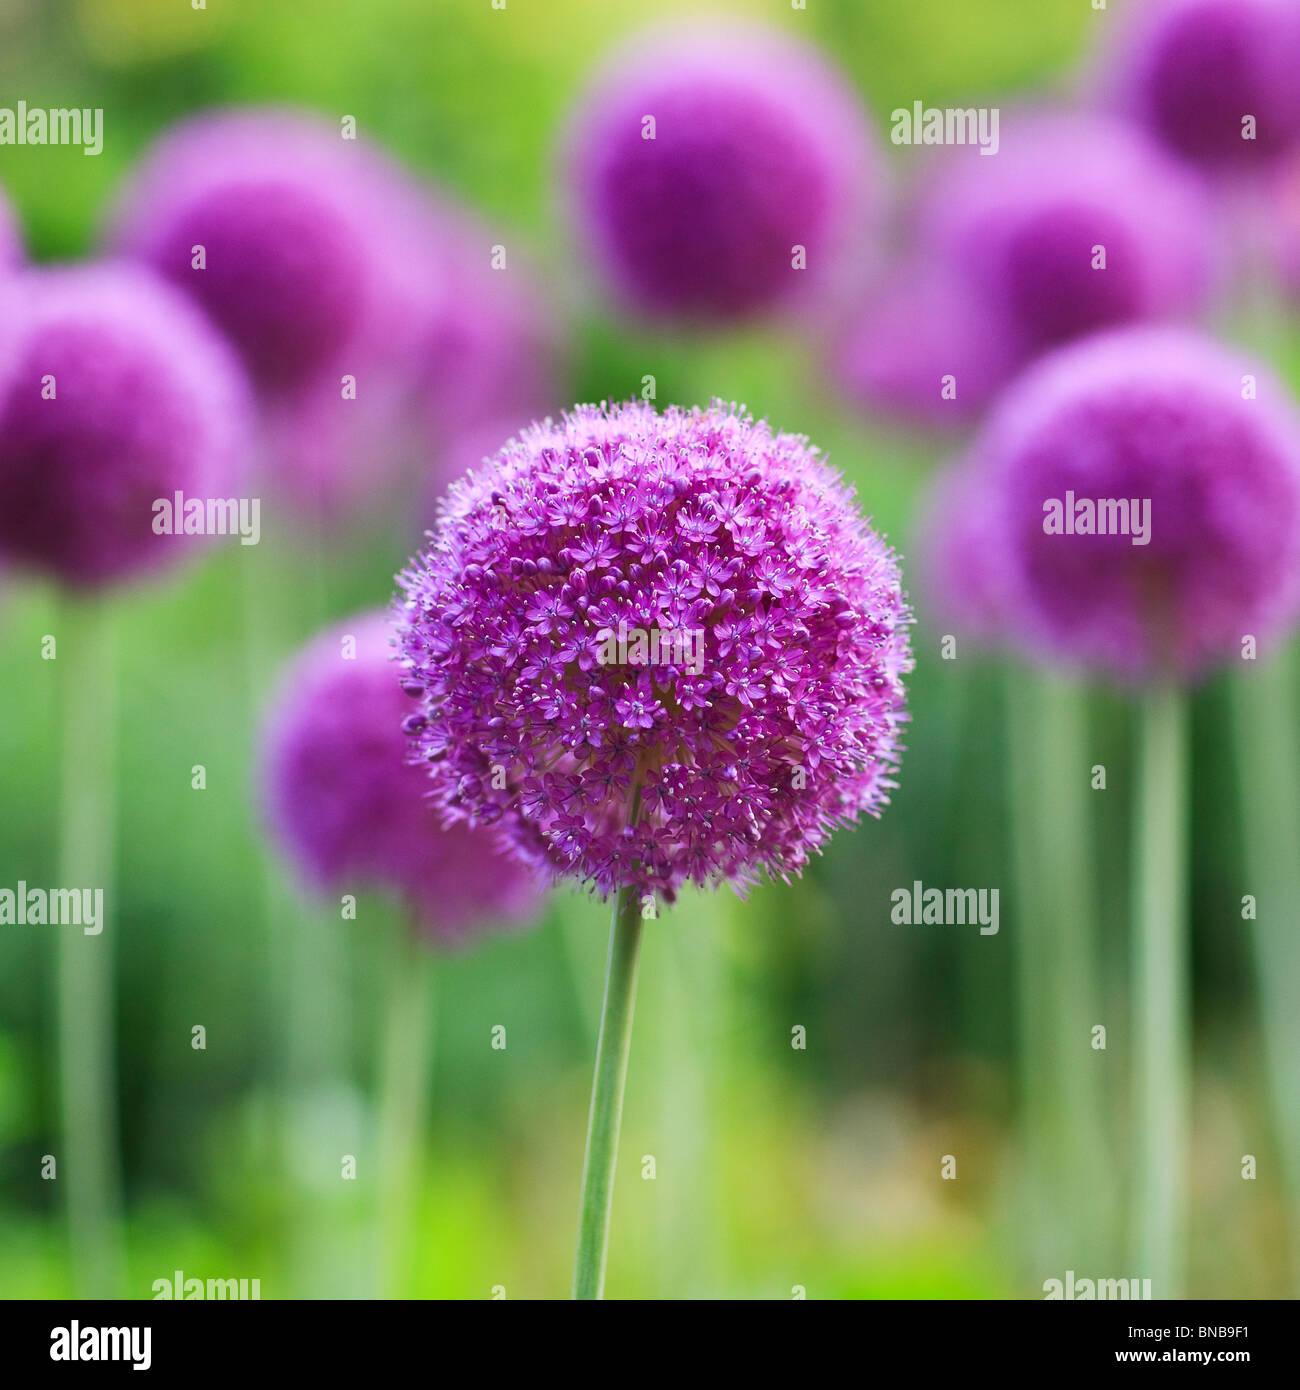 Lila Allium Blumen, englische Gärten, Assiniboine Park, Winnipeg, Manitoba, Kanada. Stockbild